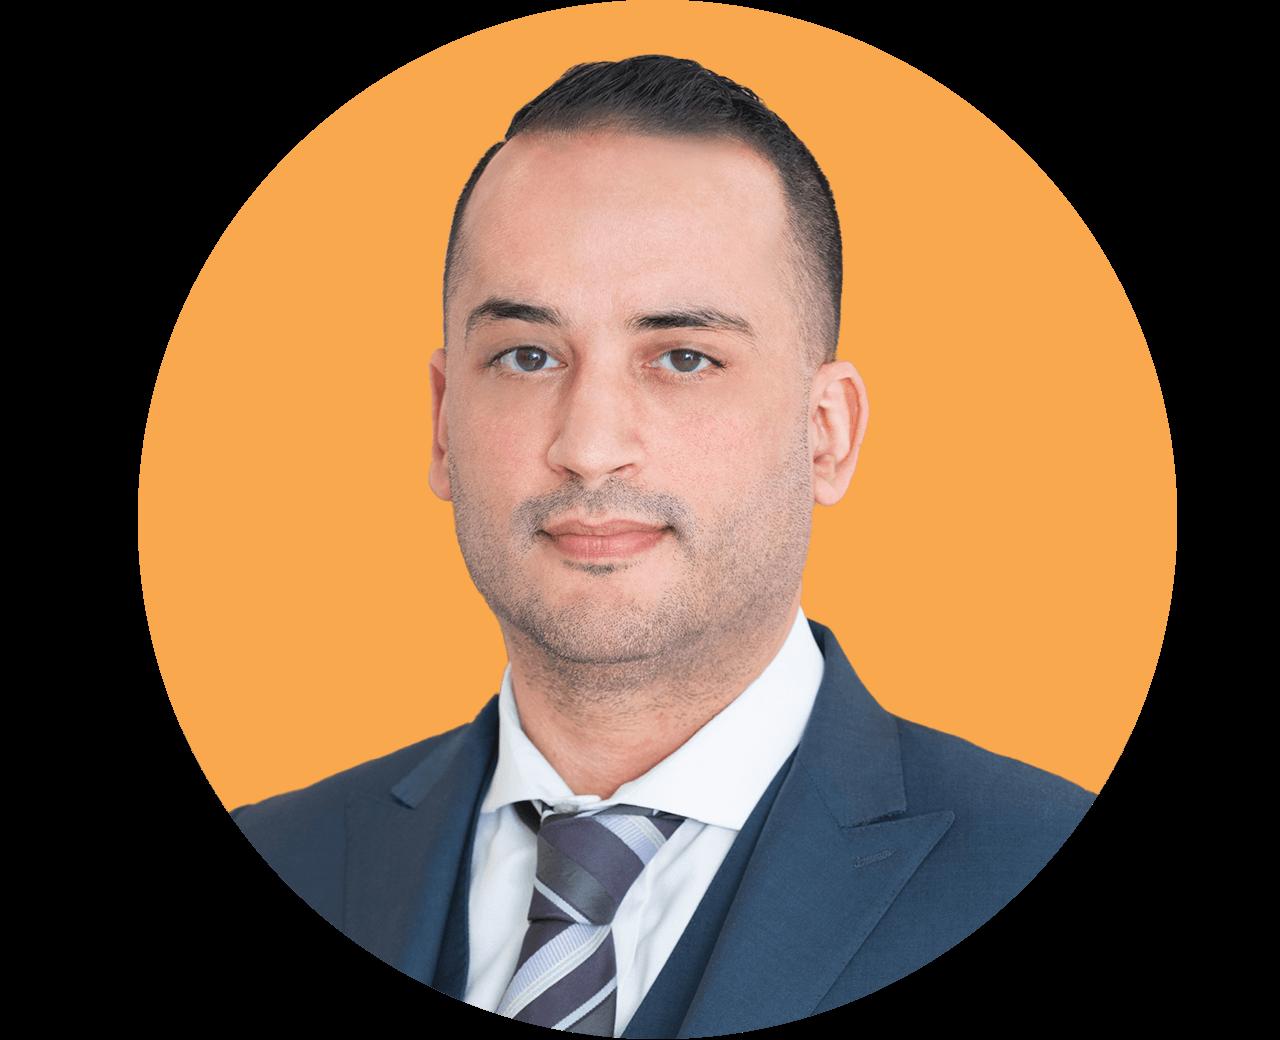 Monti Saroya headshot